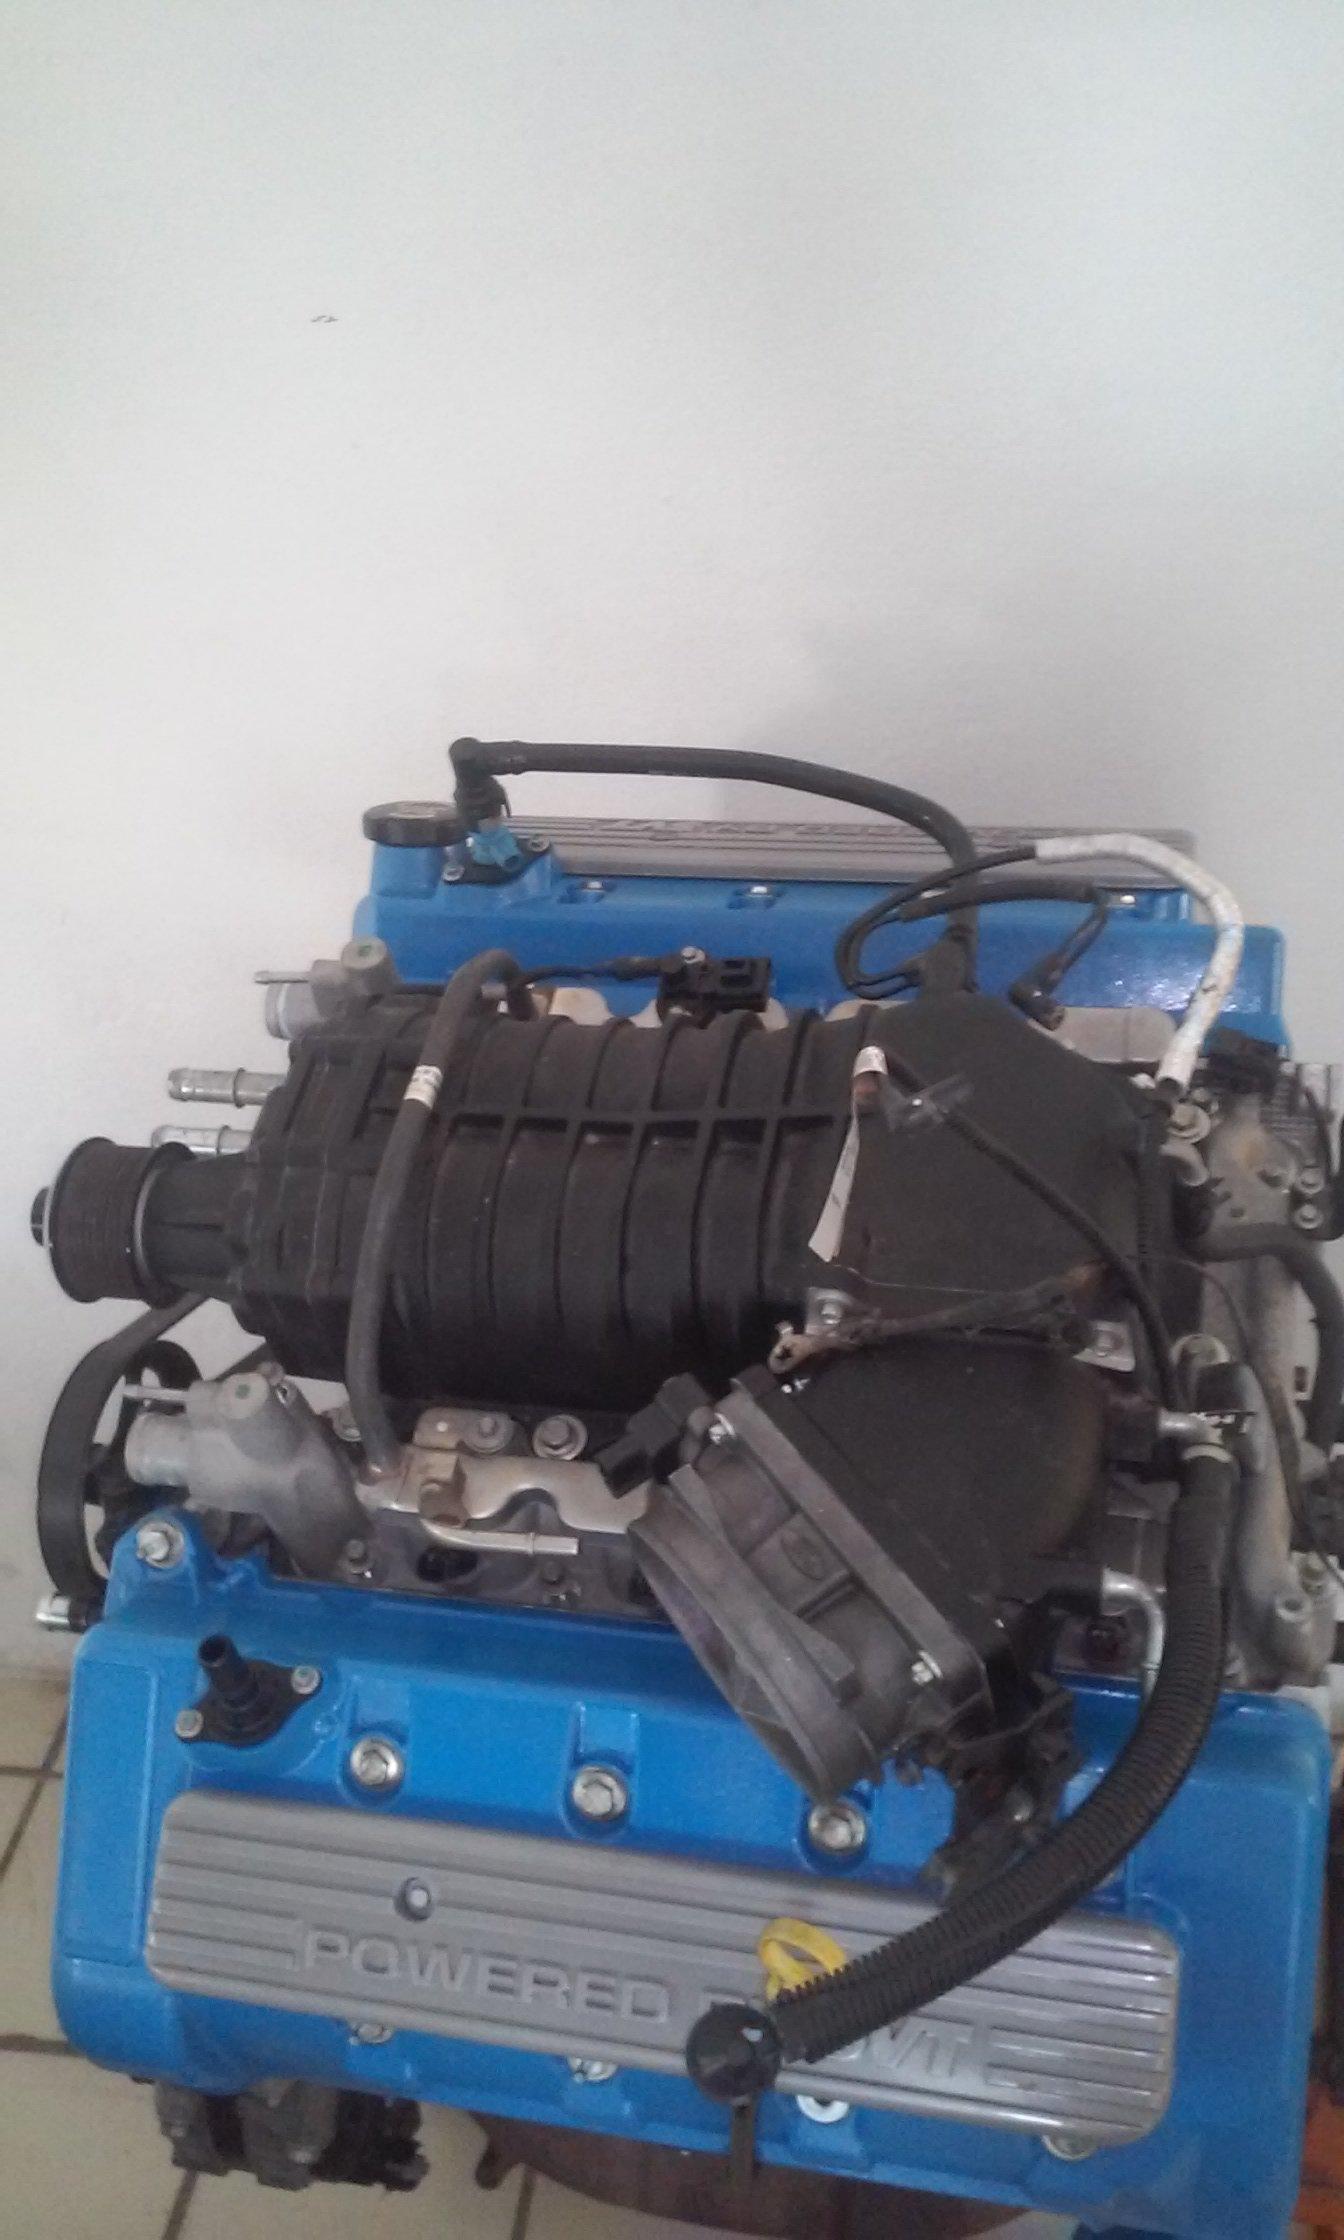 2001 Lightning 2010 GT500 engine swap    SVTPerformance com